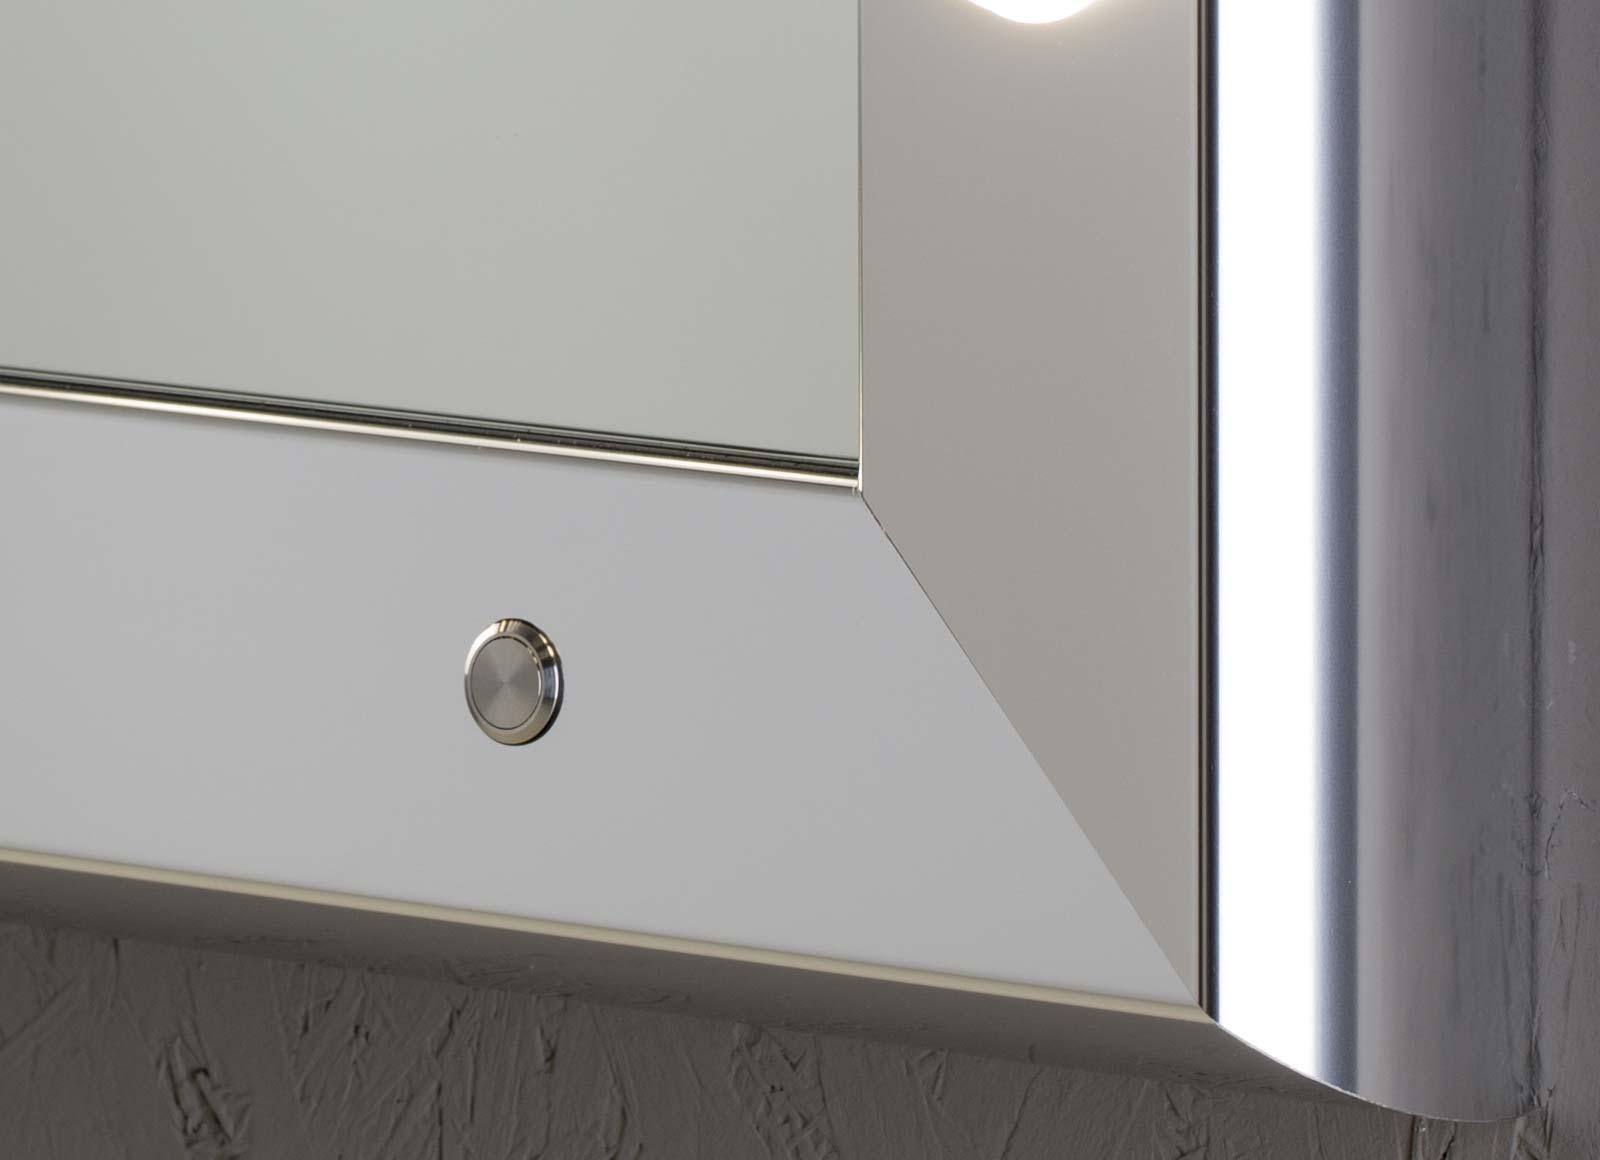 detail-SP-specchi-da-parete-1-hr